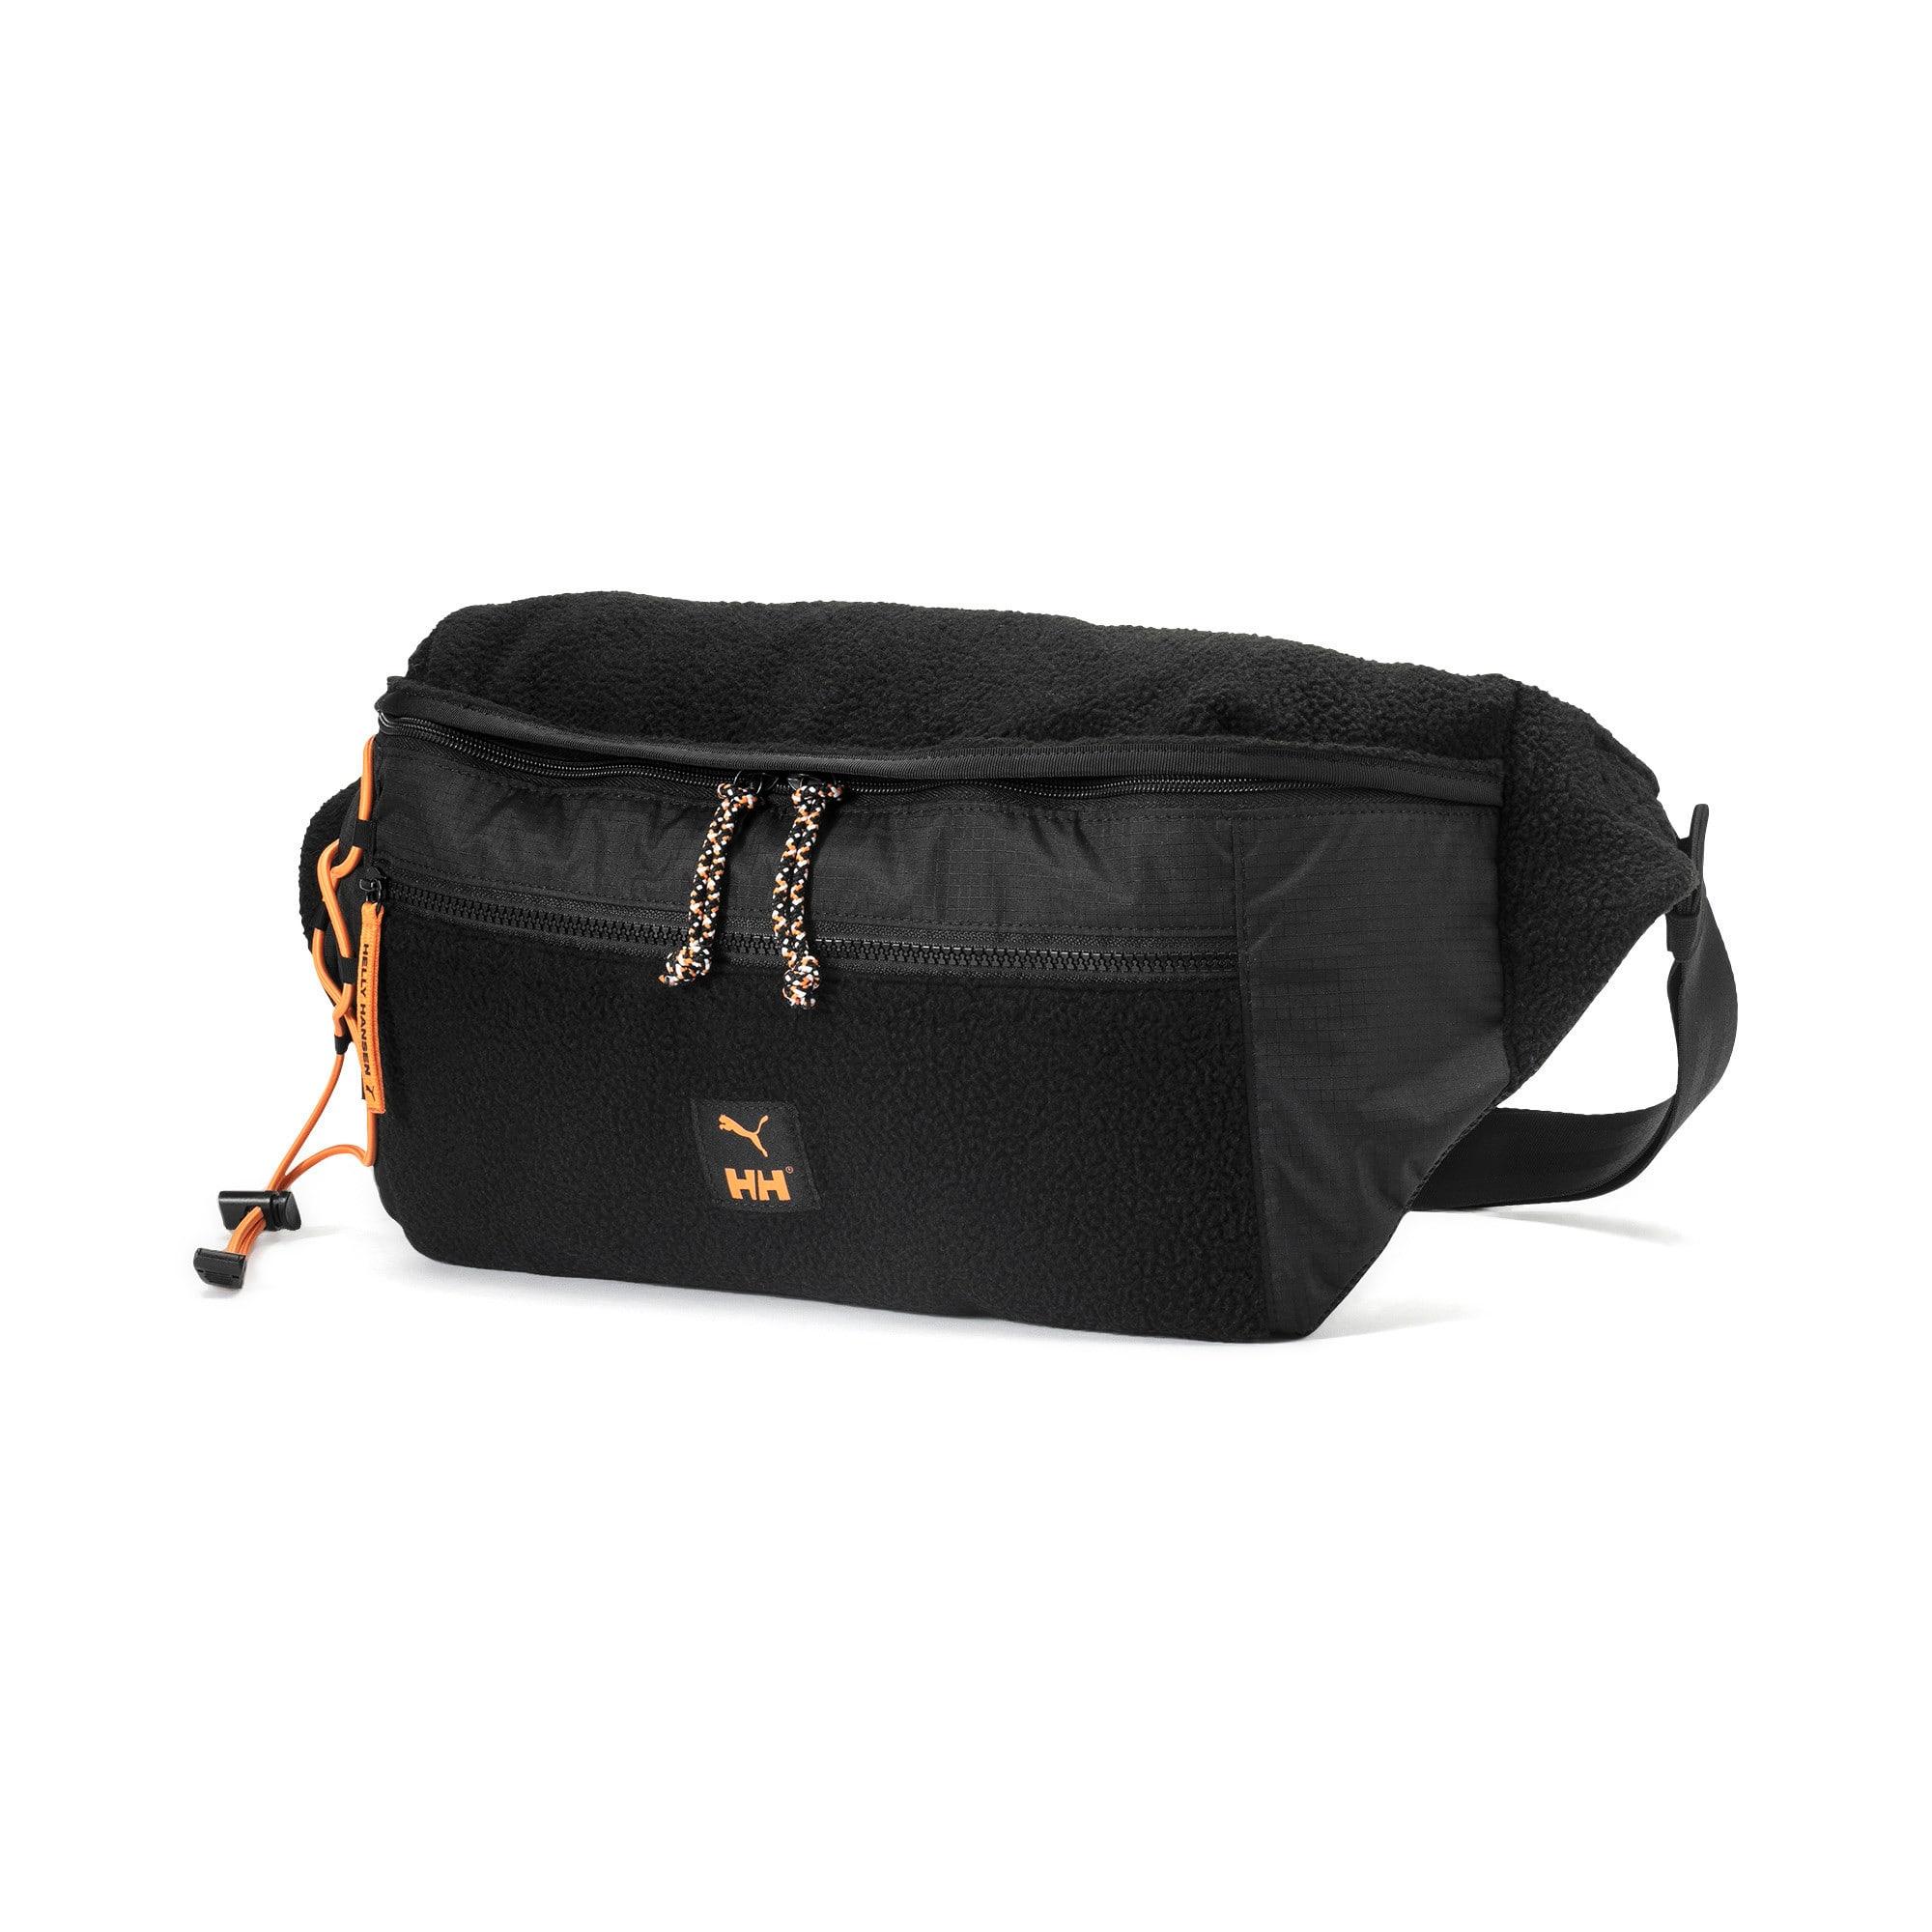 Thumbnail 1 of PUMA x HELLY HANSEN Oversized Waist Bag, Puma Black, medium